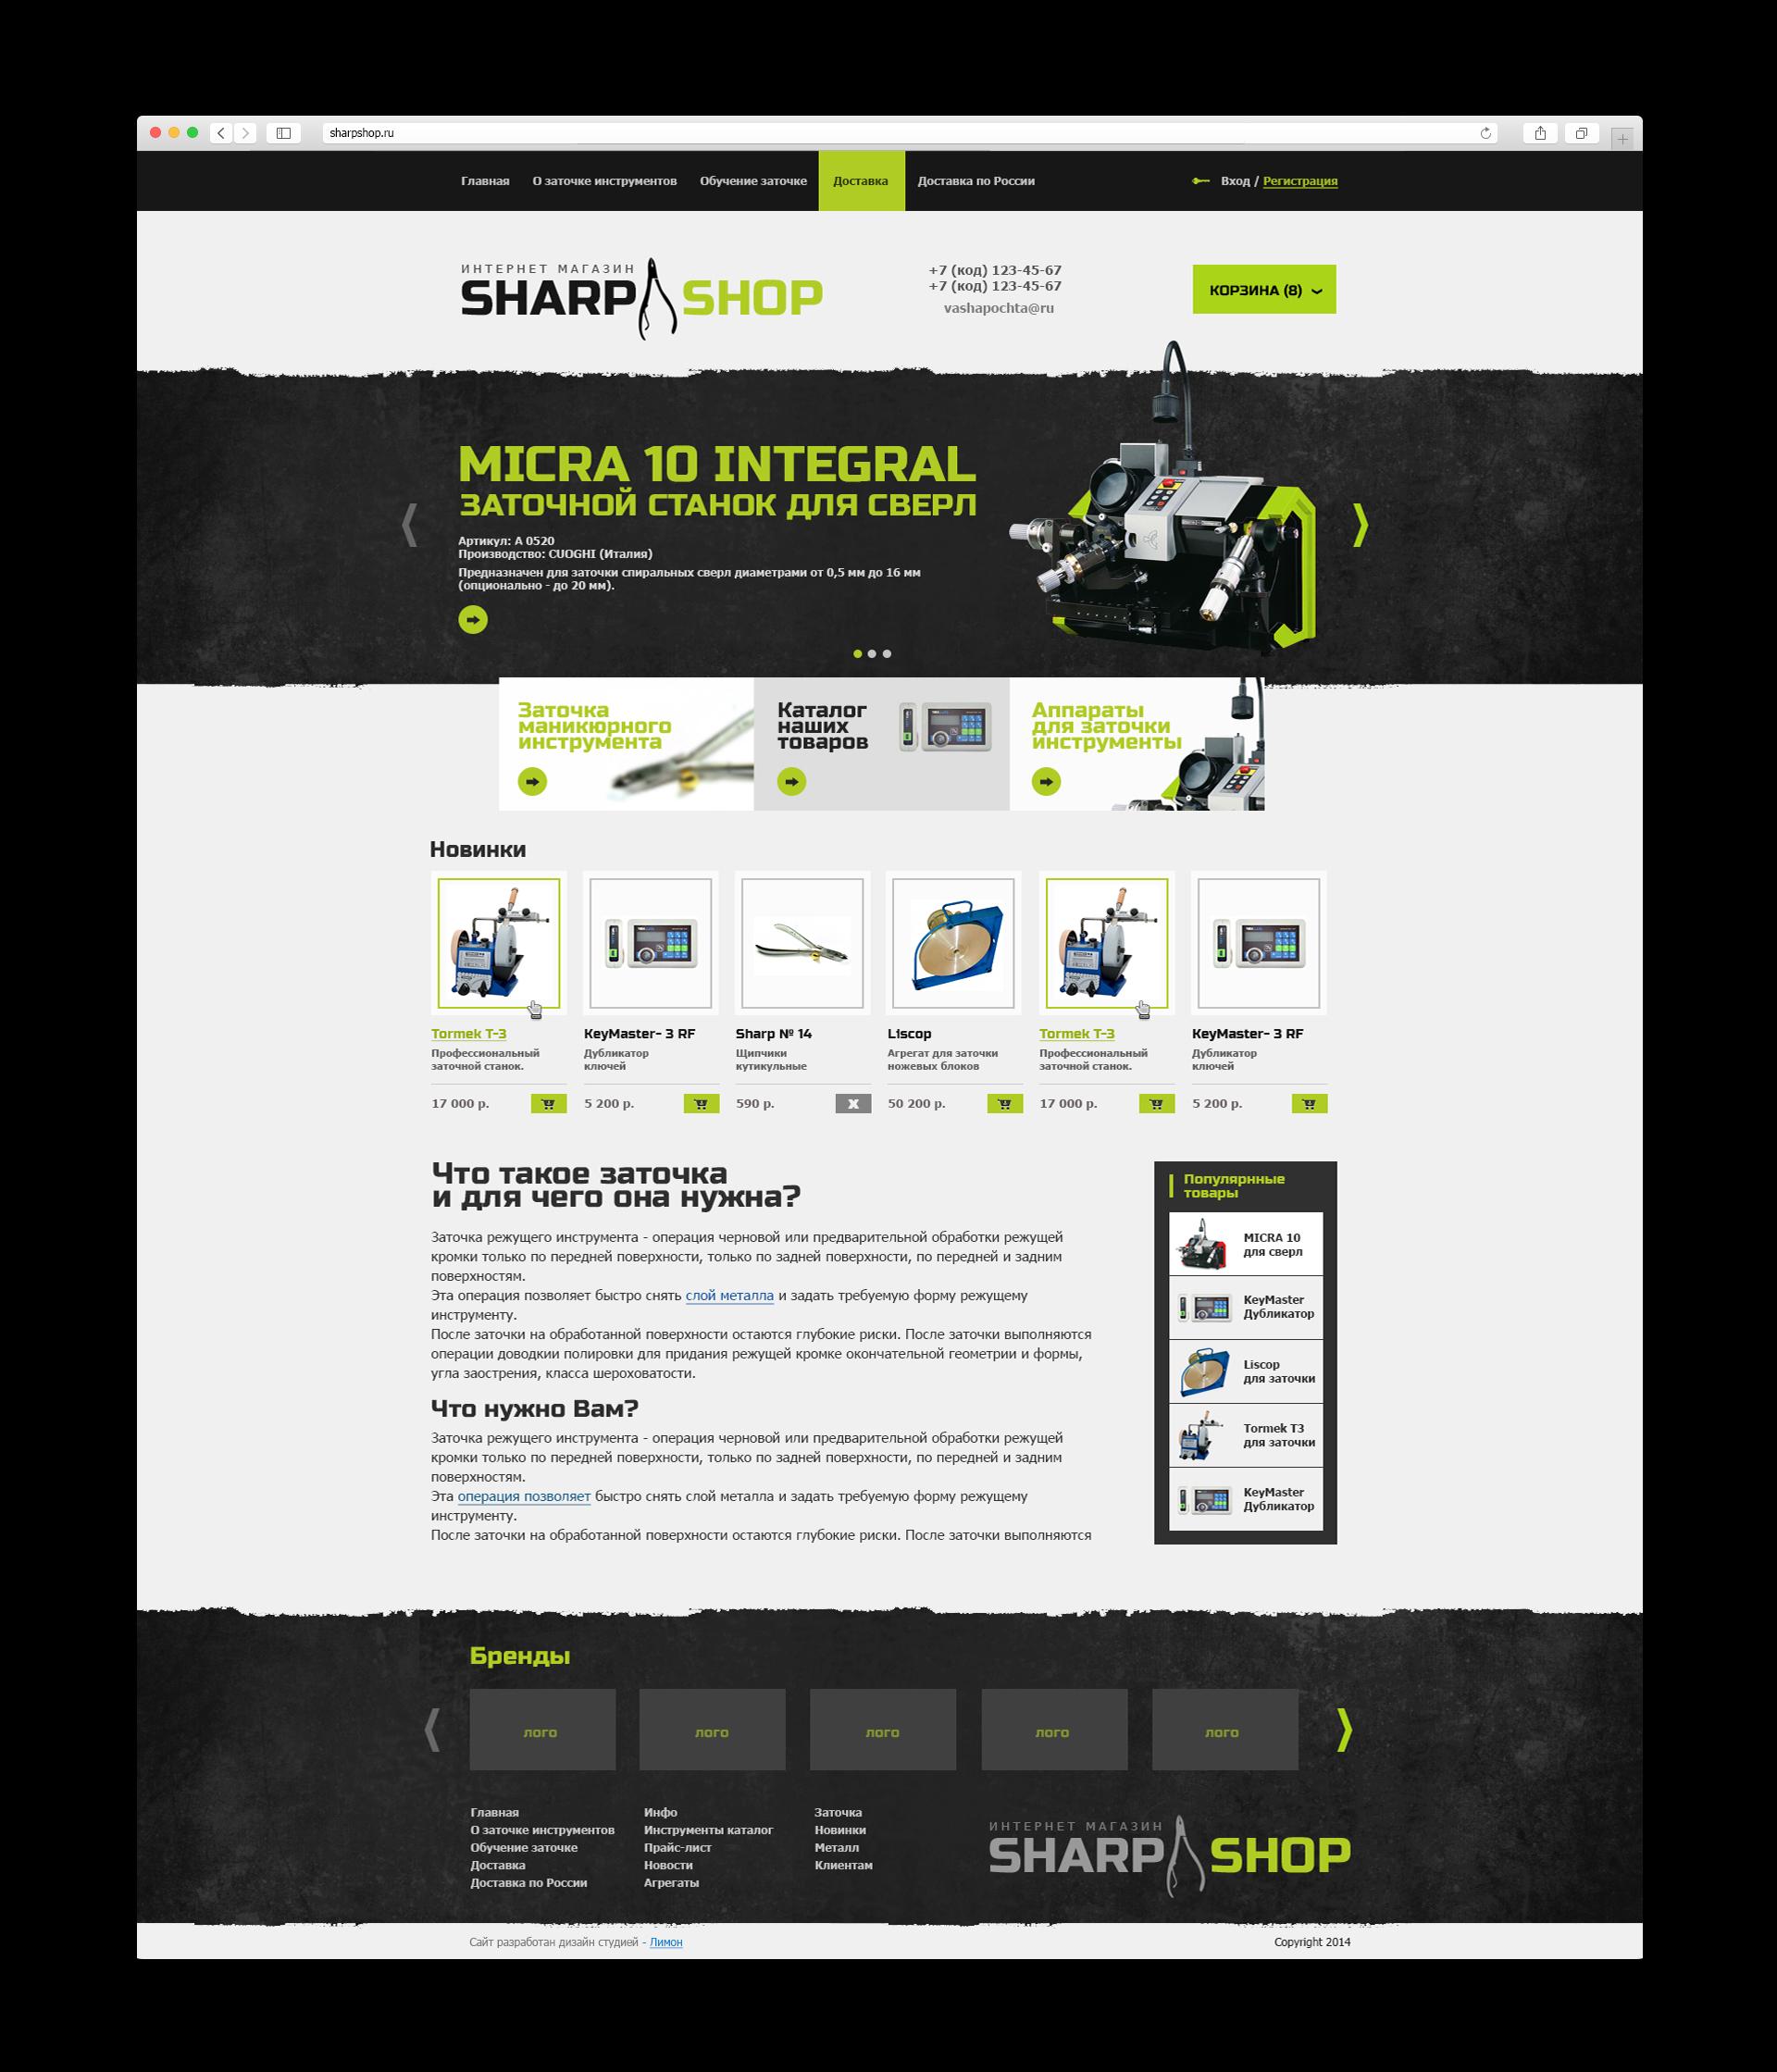 Дизайн сайта интернет - магазина Sharp shop